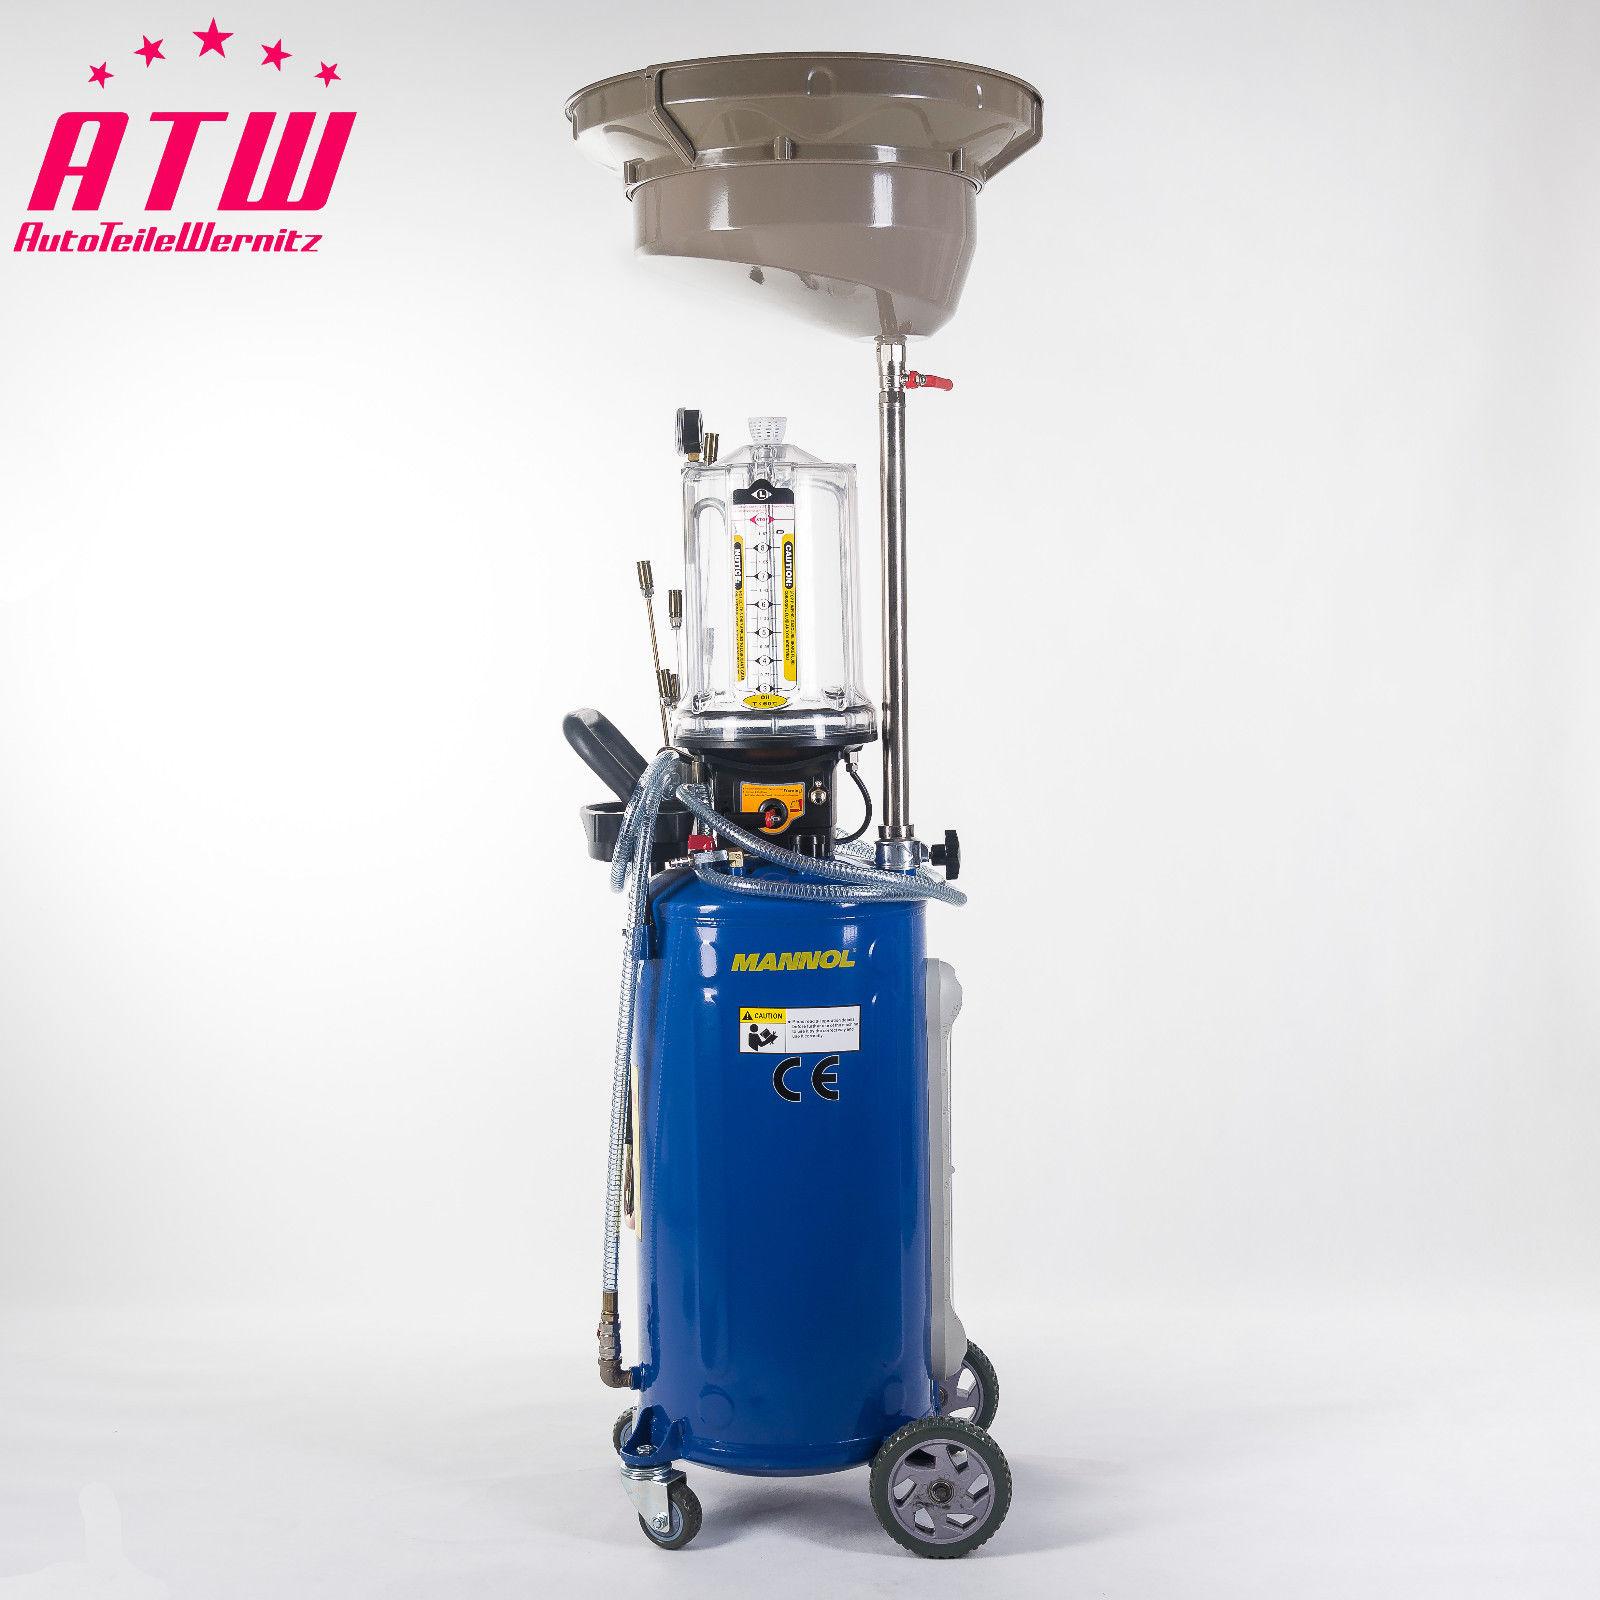 Profi Werkzeug- Altölabsauger Altölsammler Ölauffanggerät Ölabsauggerät 80 Liter